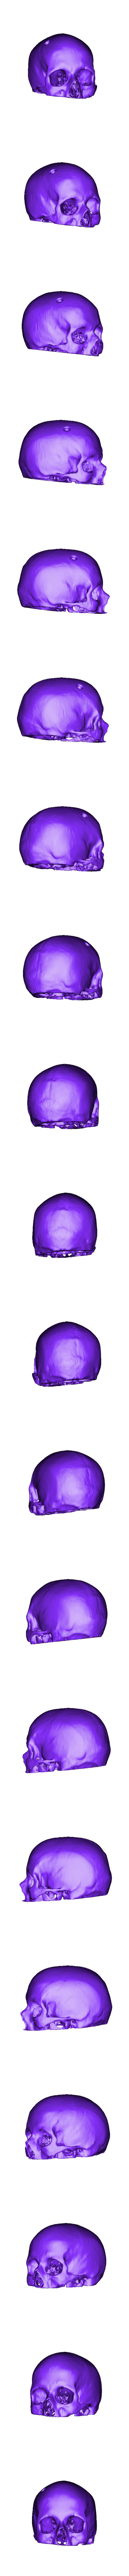 CerebrixSkullFixed.stl Télécharger fichier STL gratuit Crâne humain Cerebrix • Modèle à imprimer en 3D, Cults